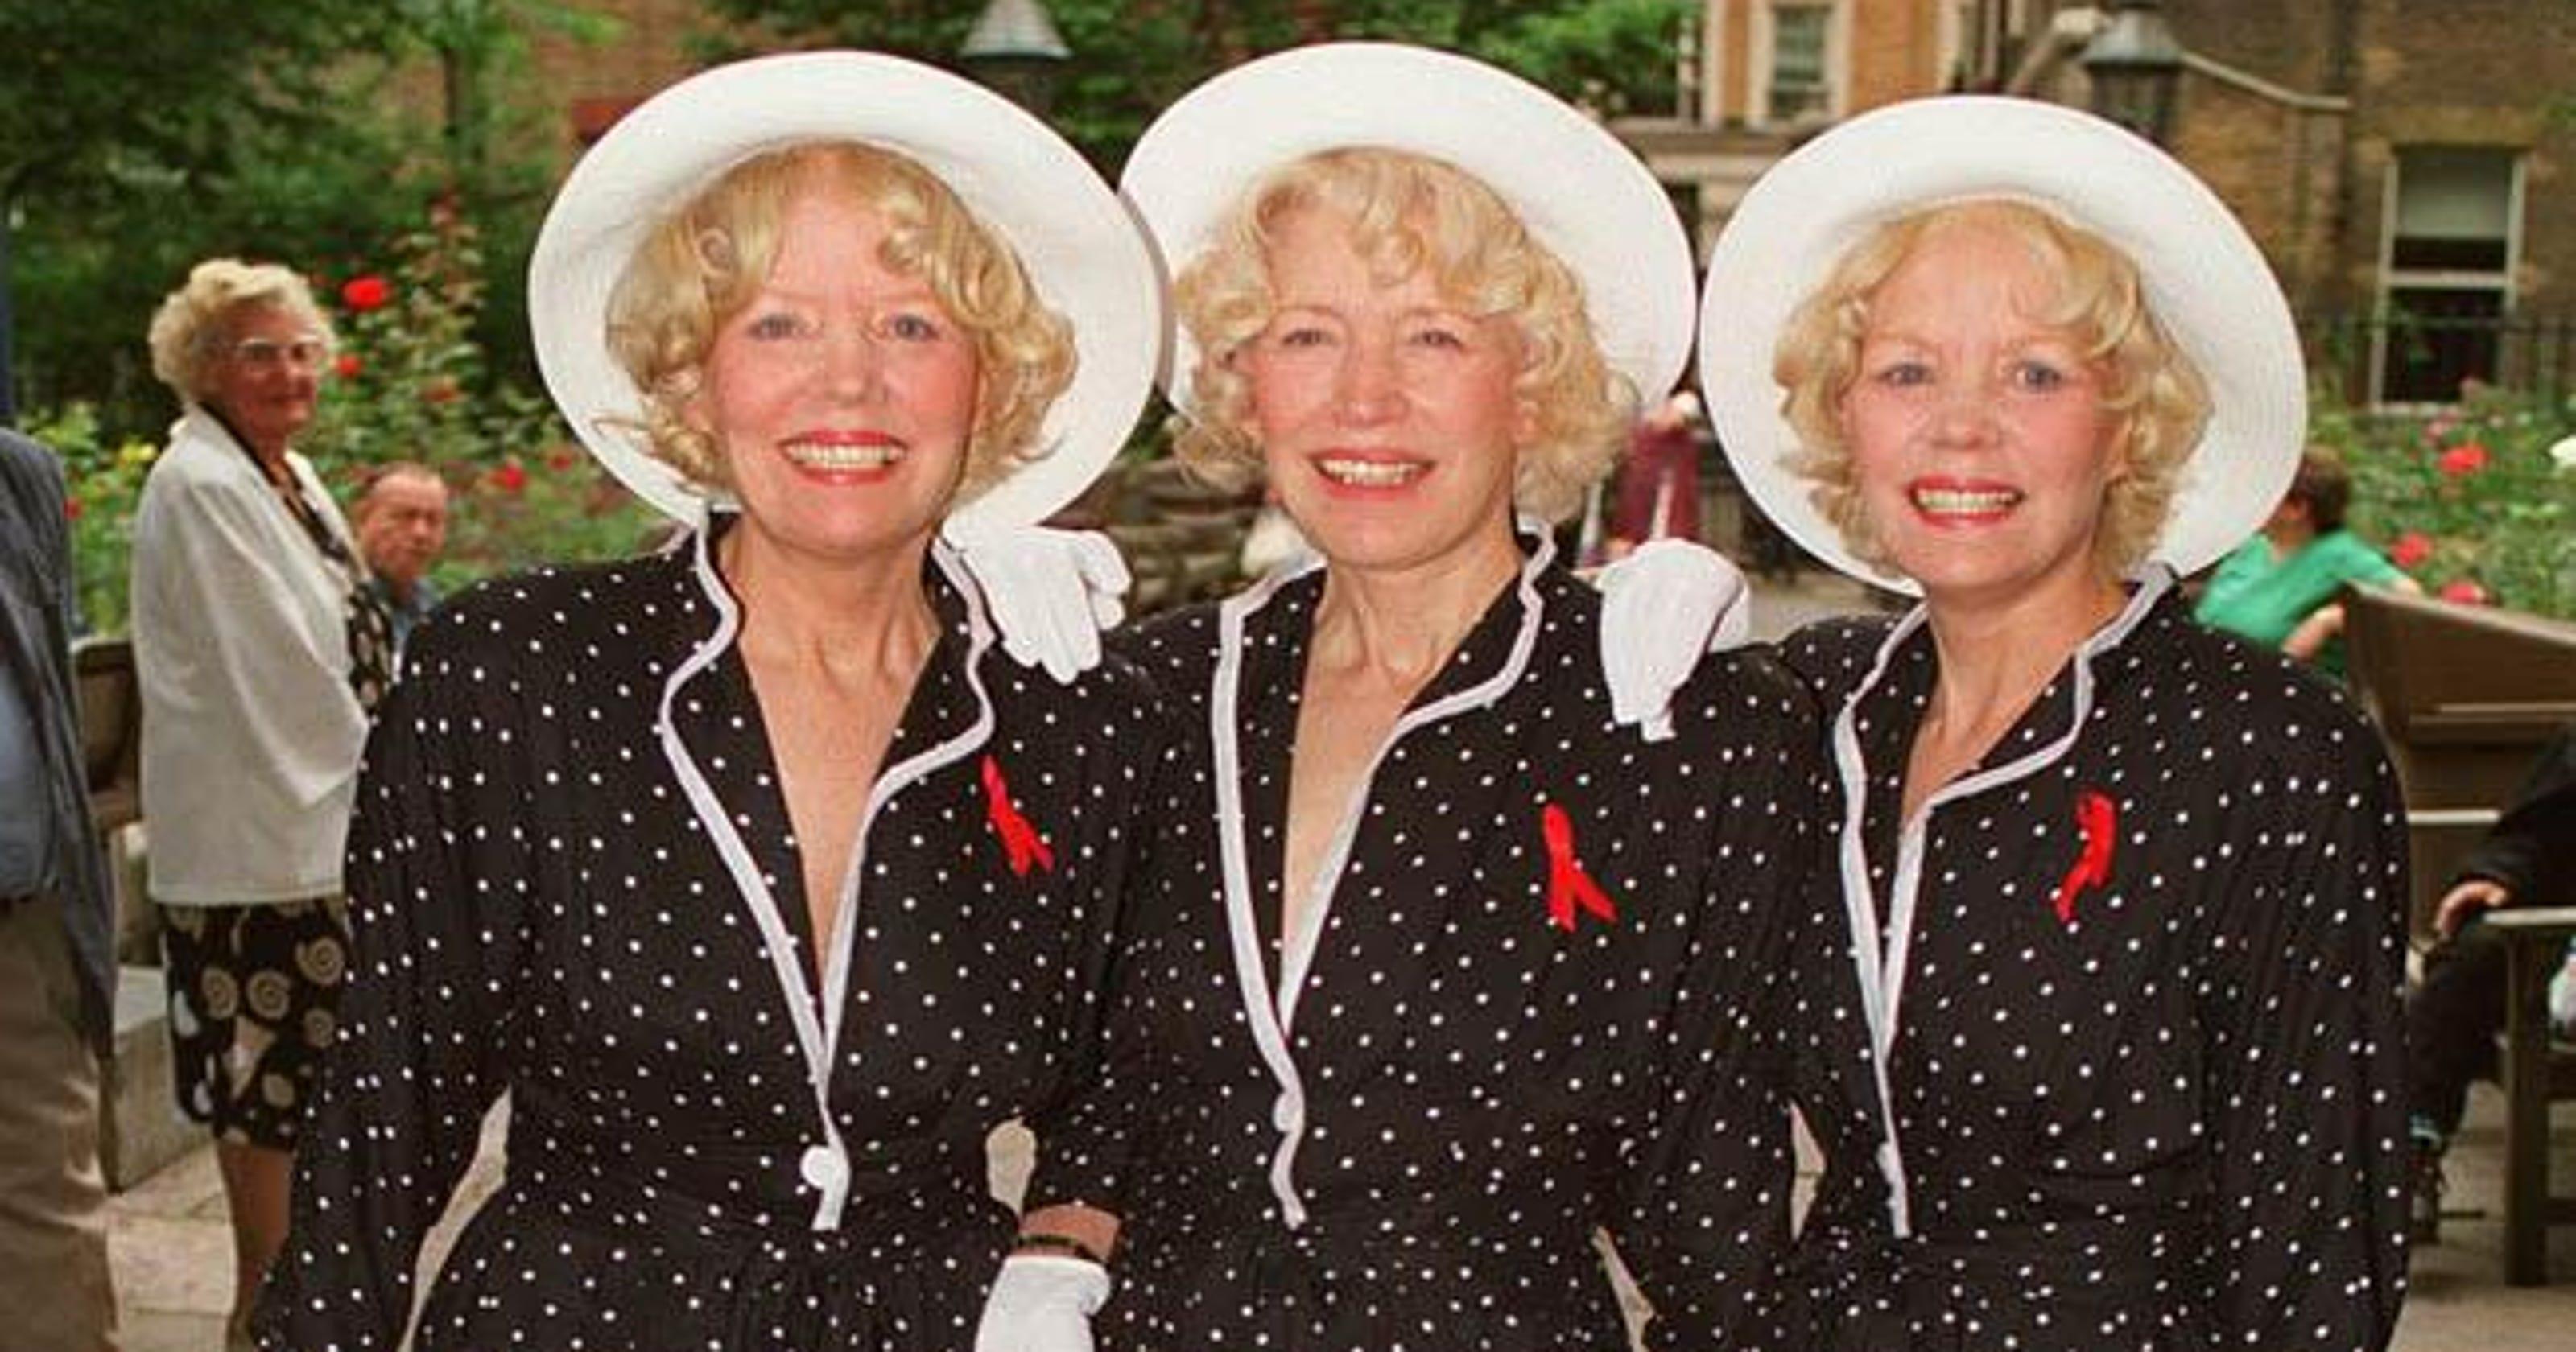 cb76e7d9455 Joy Beverley dies at 91